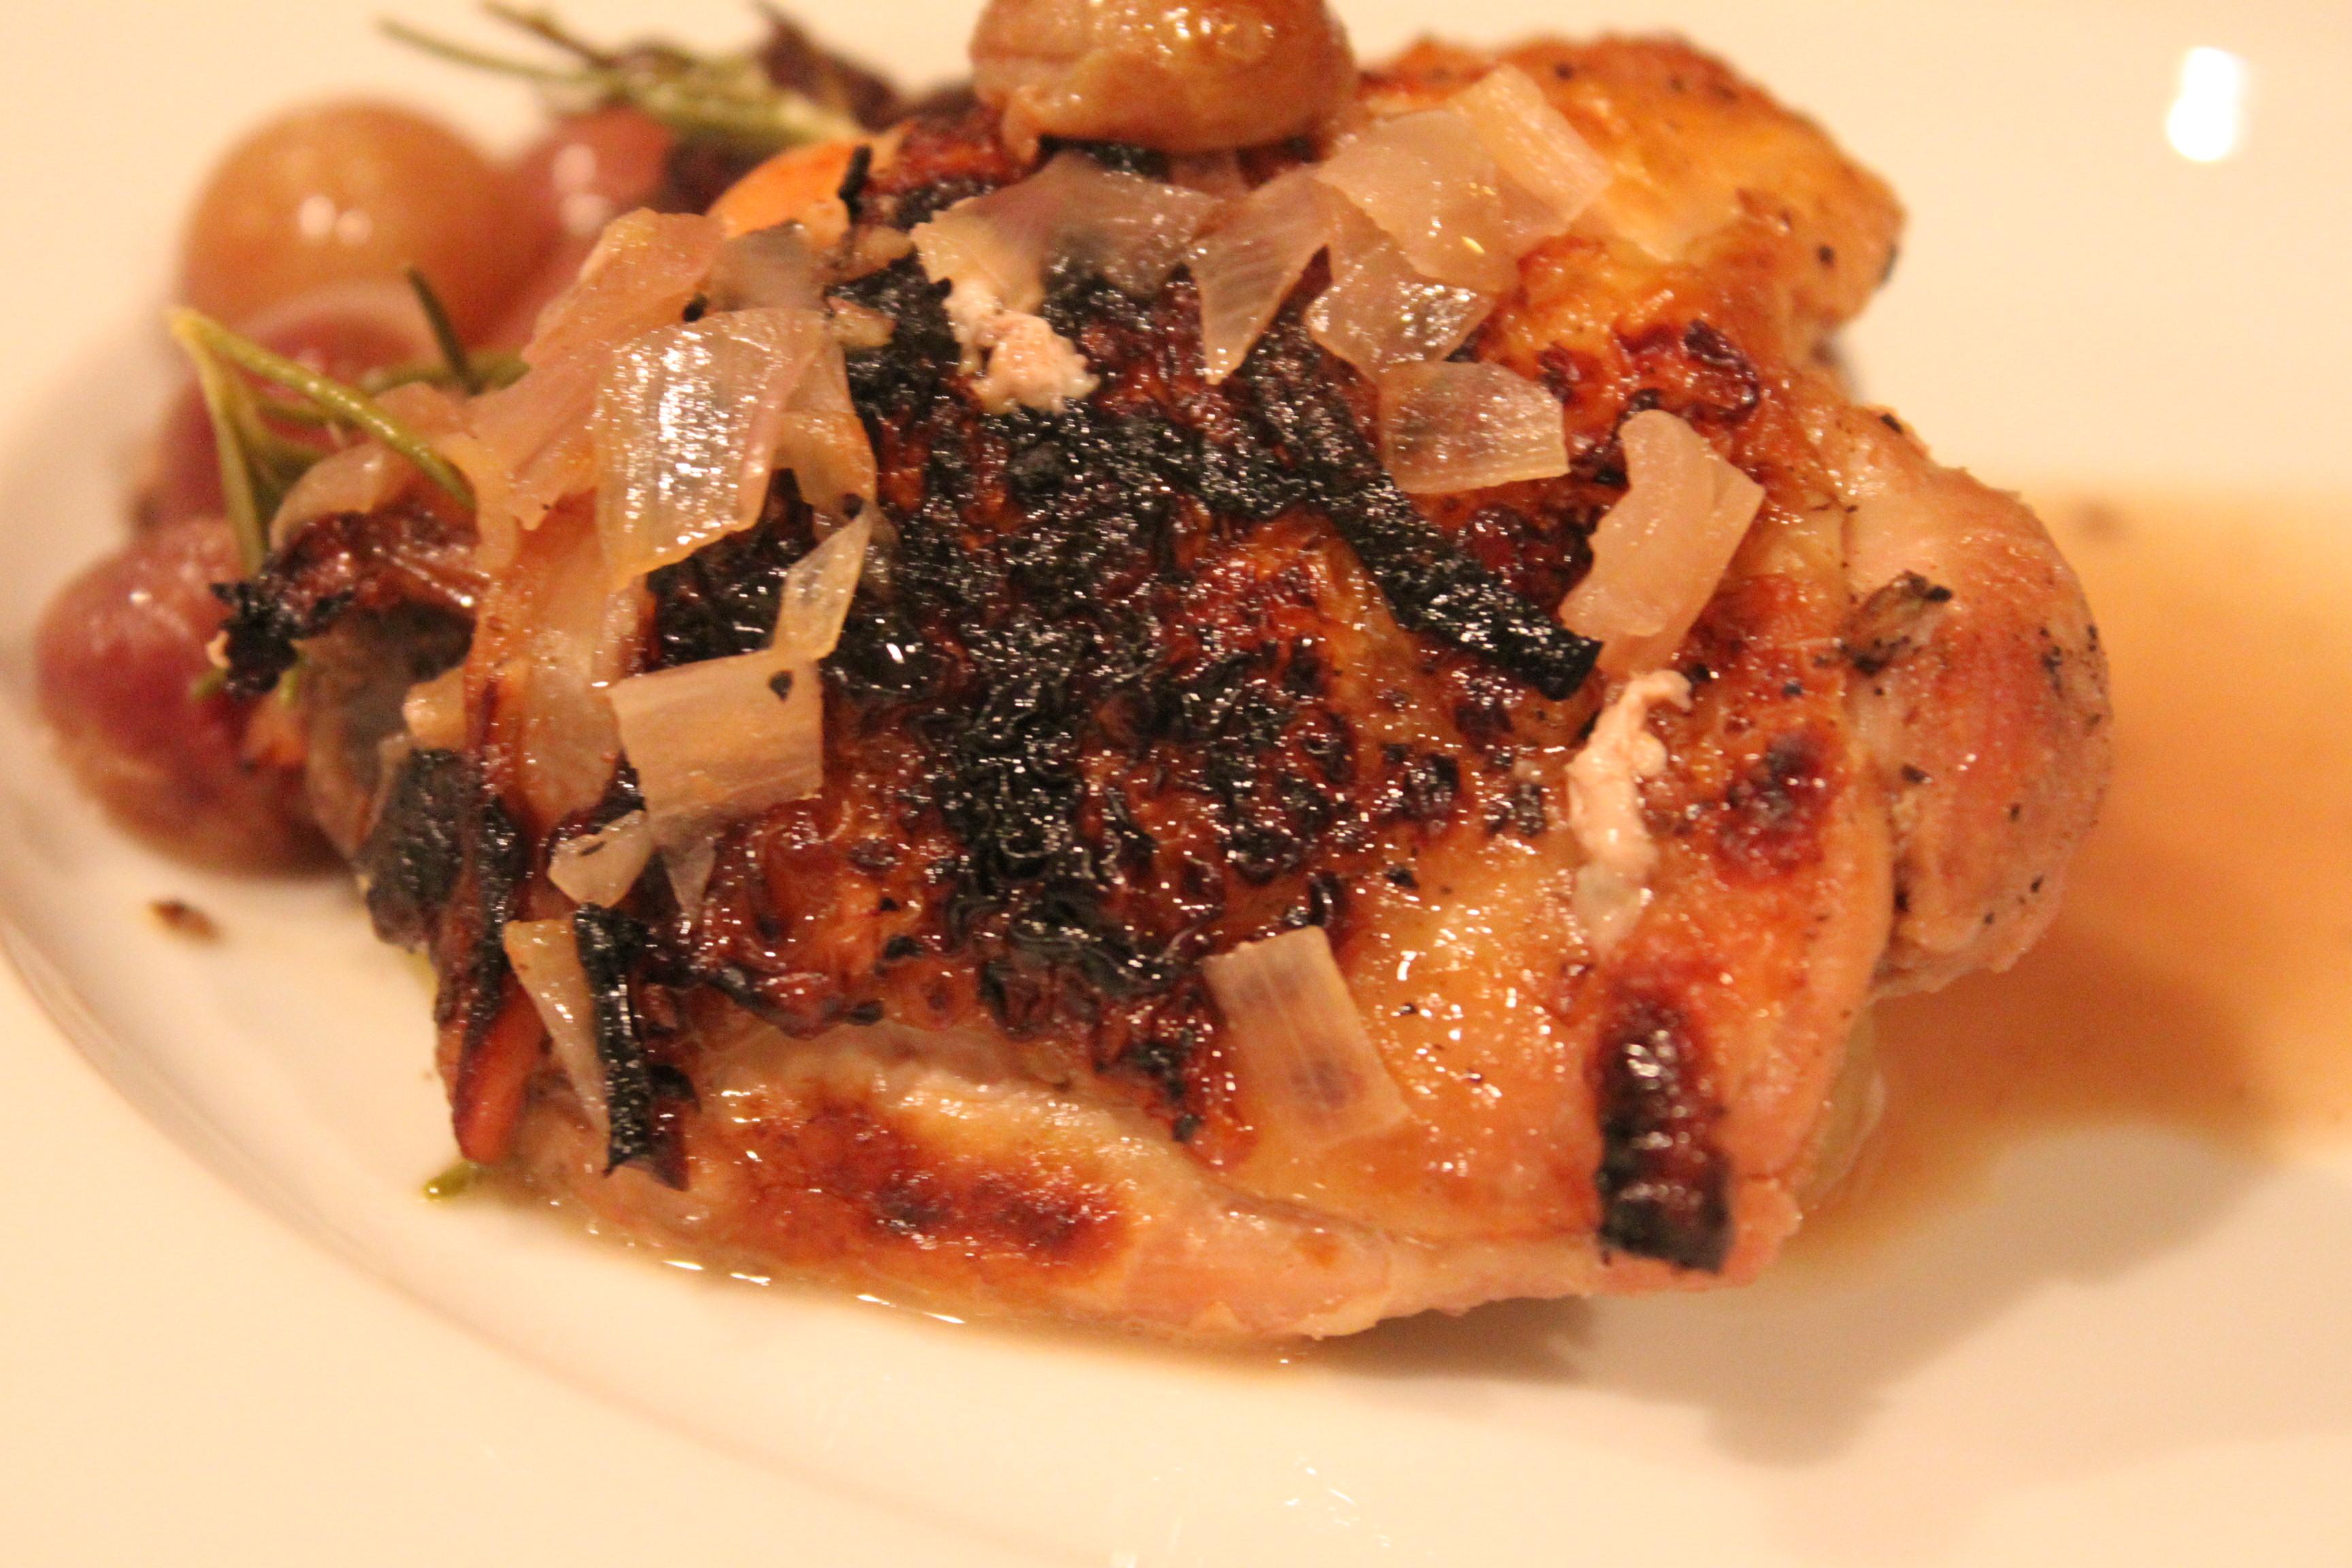 smitten kitchen – DINNER CHEZ NOUS